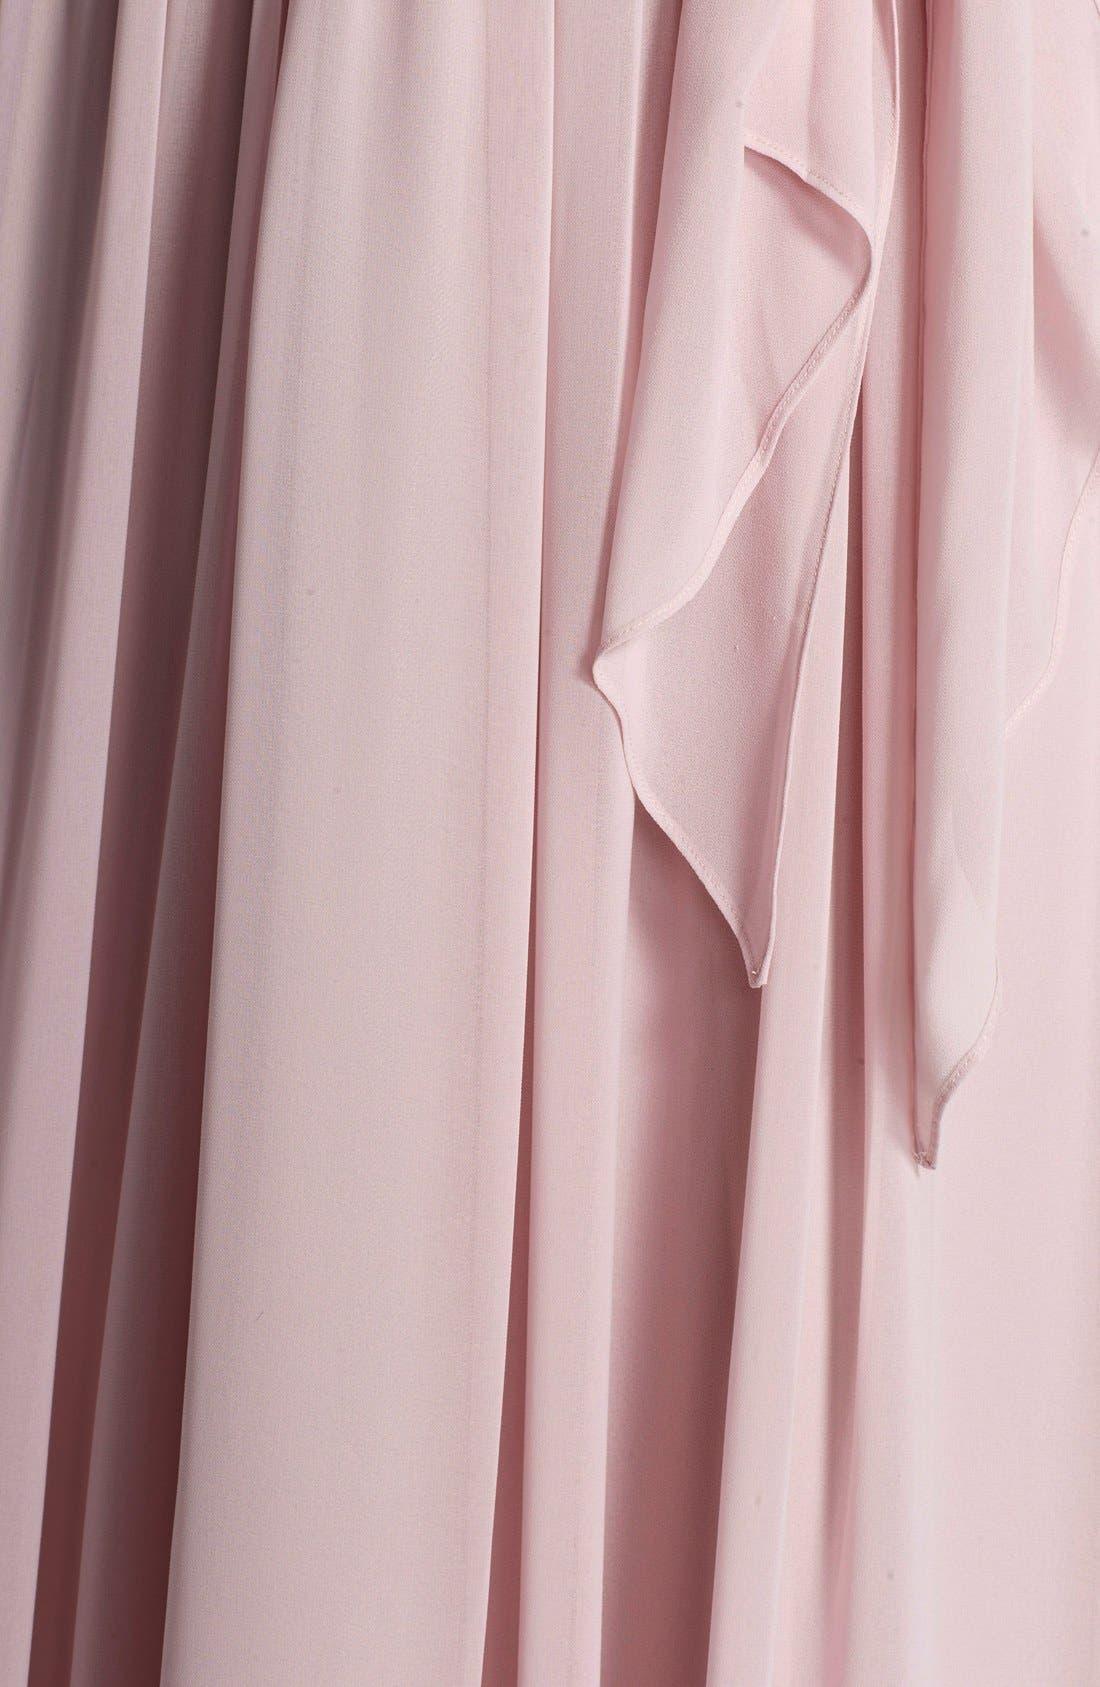 Alternate Image 3  - Donna Morgan 'Alana' Chiffon Halter Style Gown